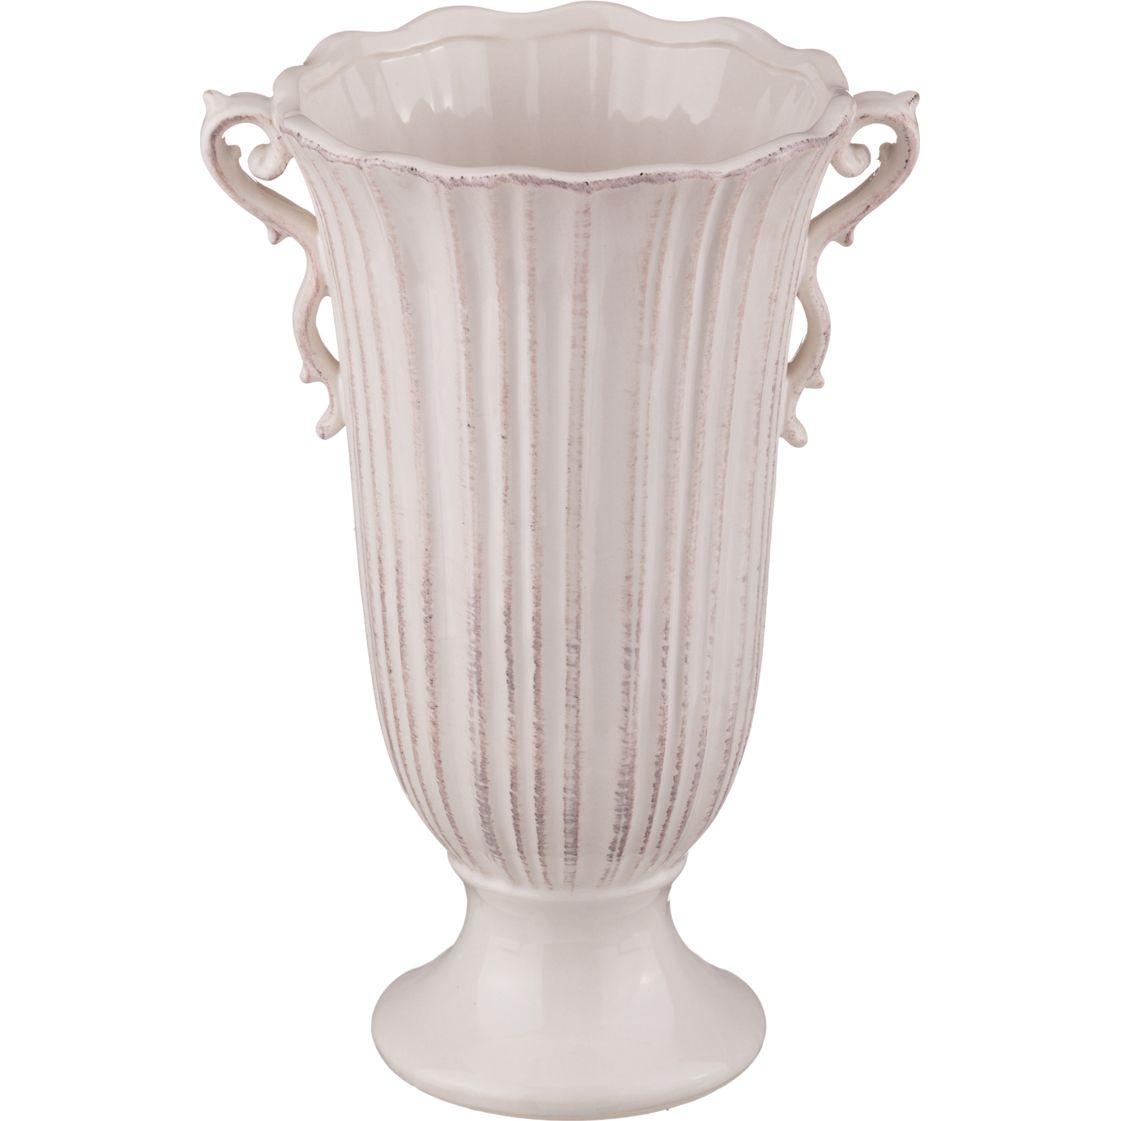 Вазы Lefard Ваза Диона Цвет: Айвори (15х27 см) lefard ваза caleigh 76 см